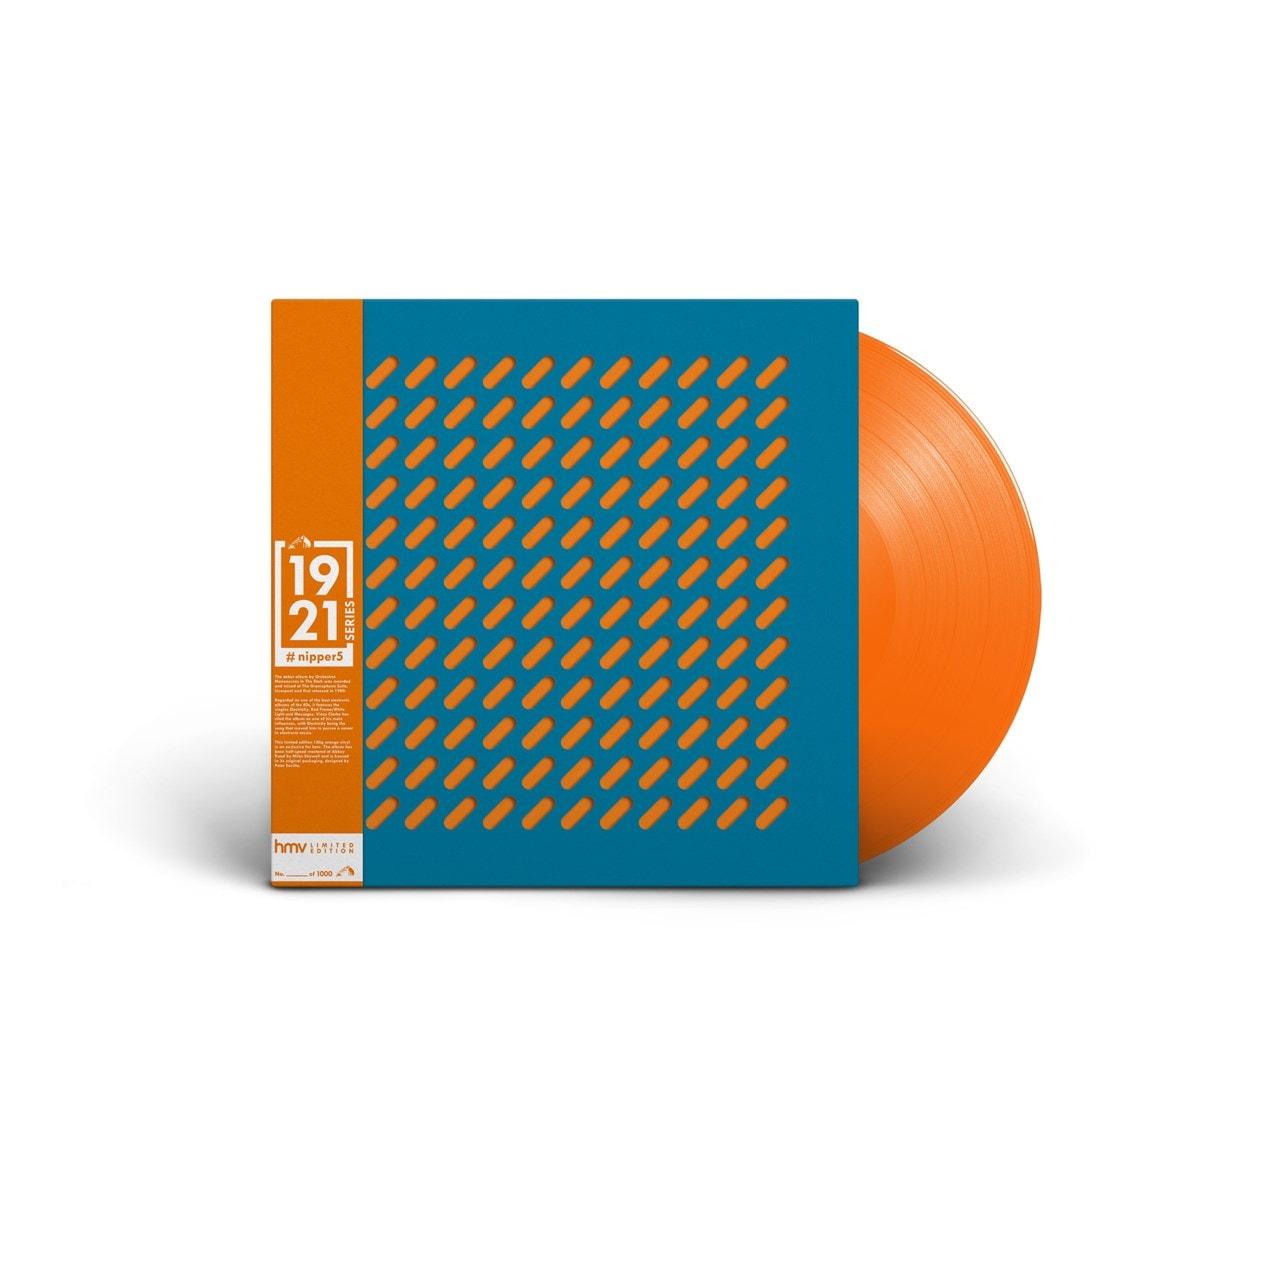 Orchestral Manoeuvres in the Dark (hmv Exclusive) 1921 Series: Orange Vinyl - 1